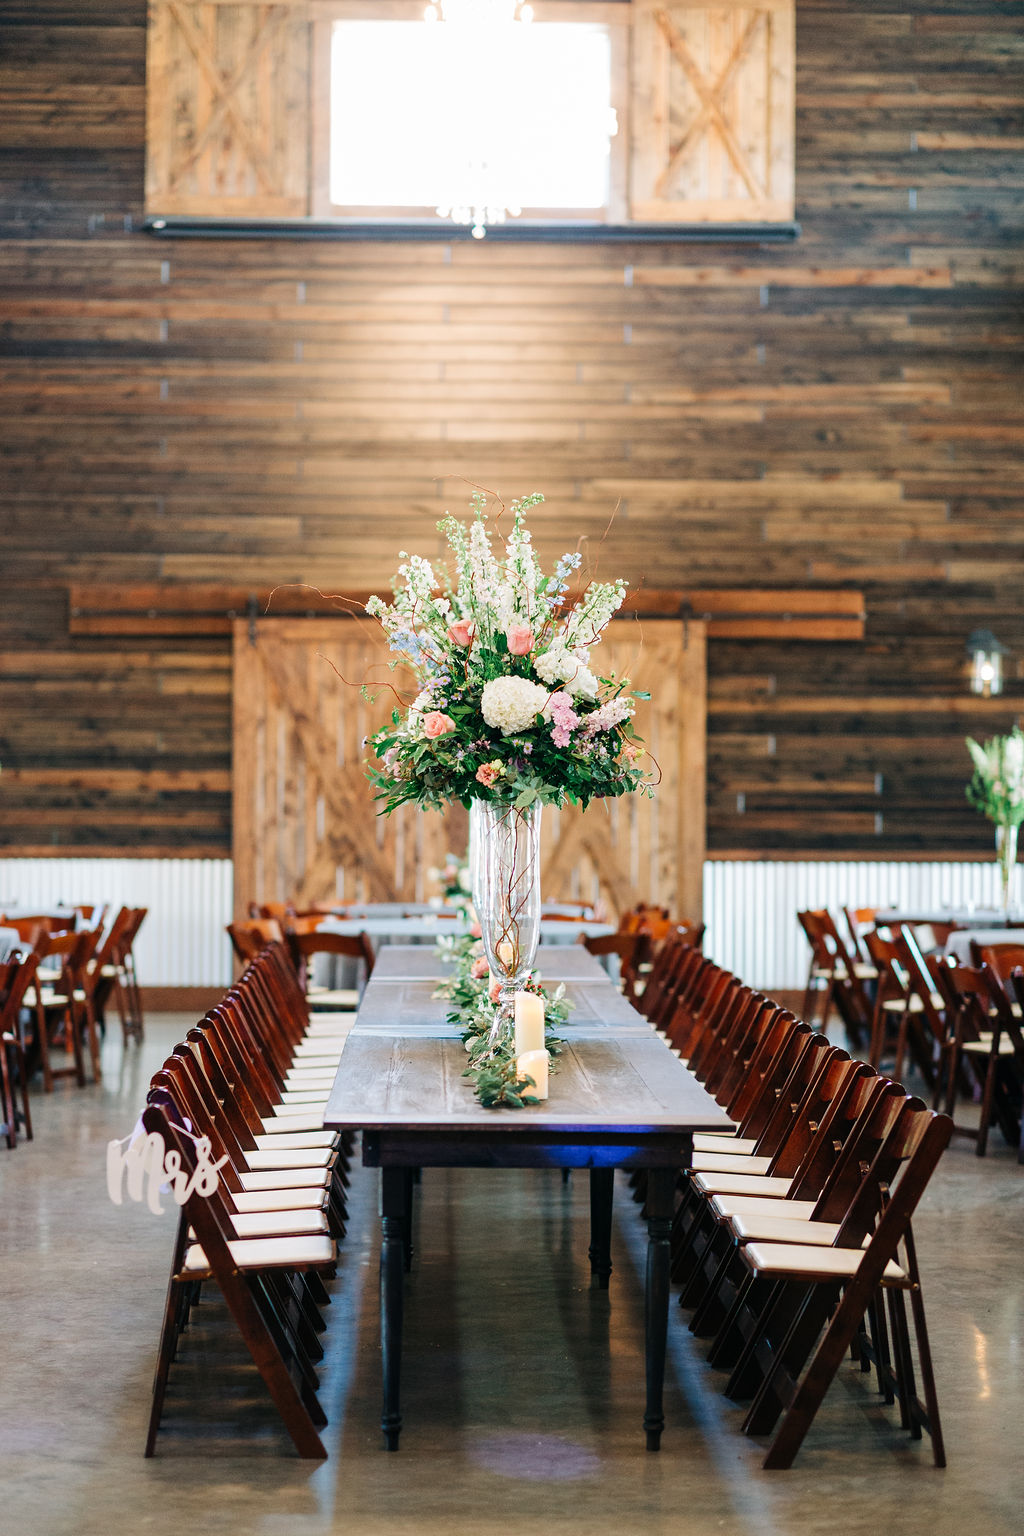 peach creek ranch wedding venue texas